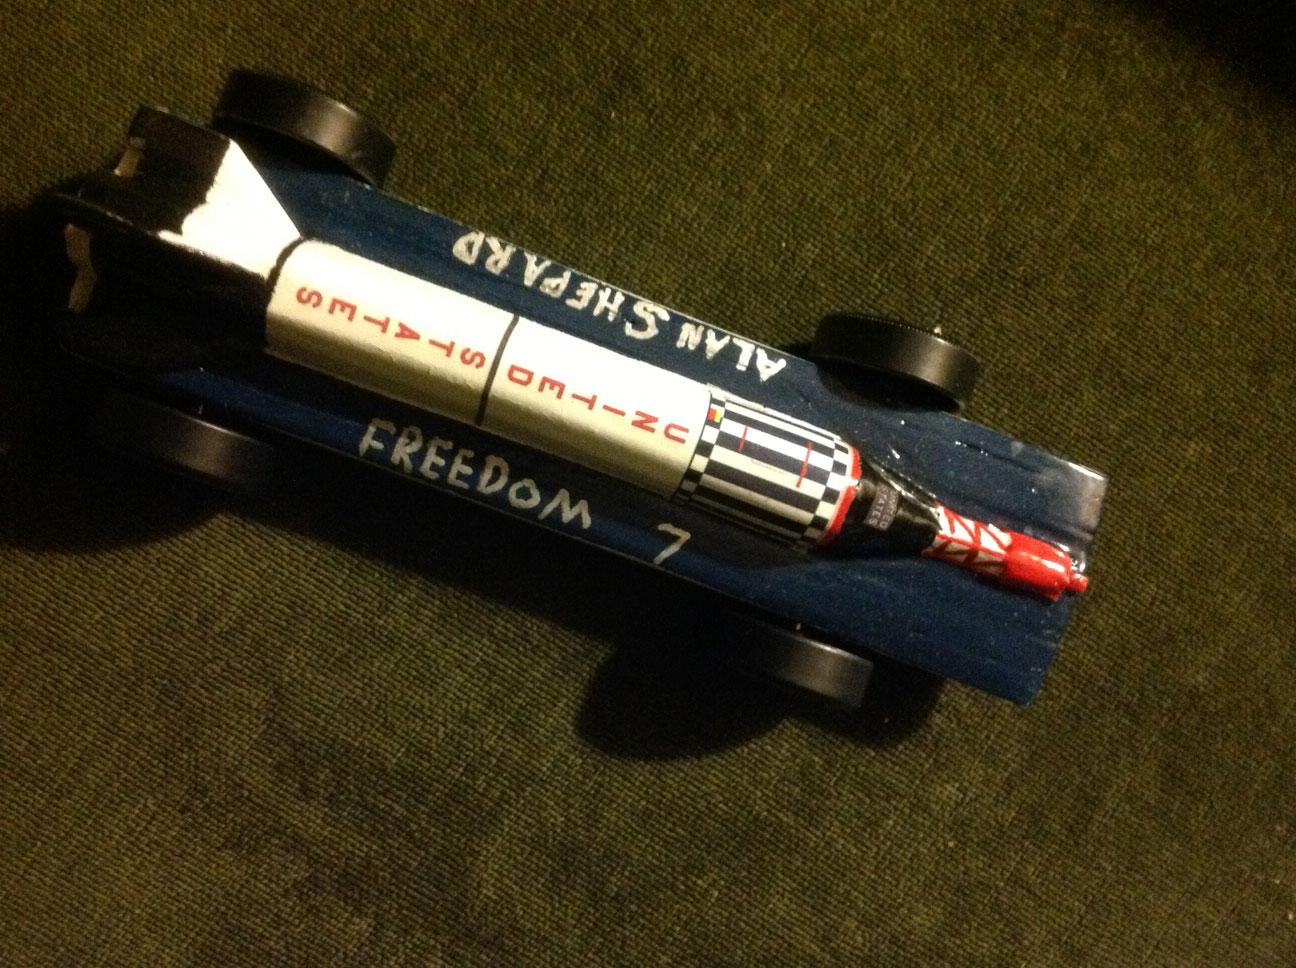 Pinewood Derby car: Alan Shepard's Freedom 7 ...